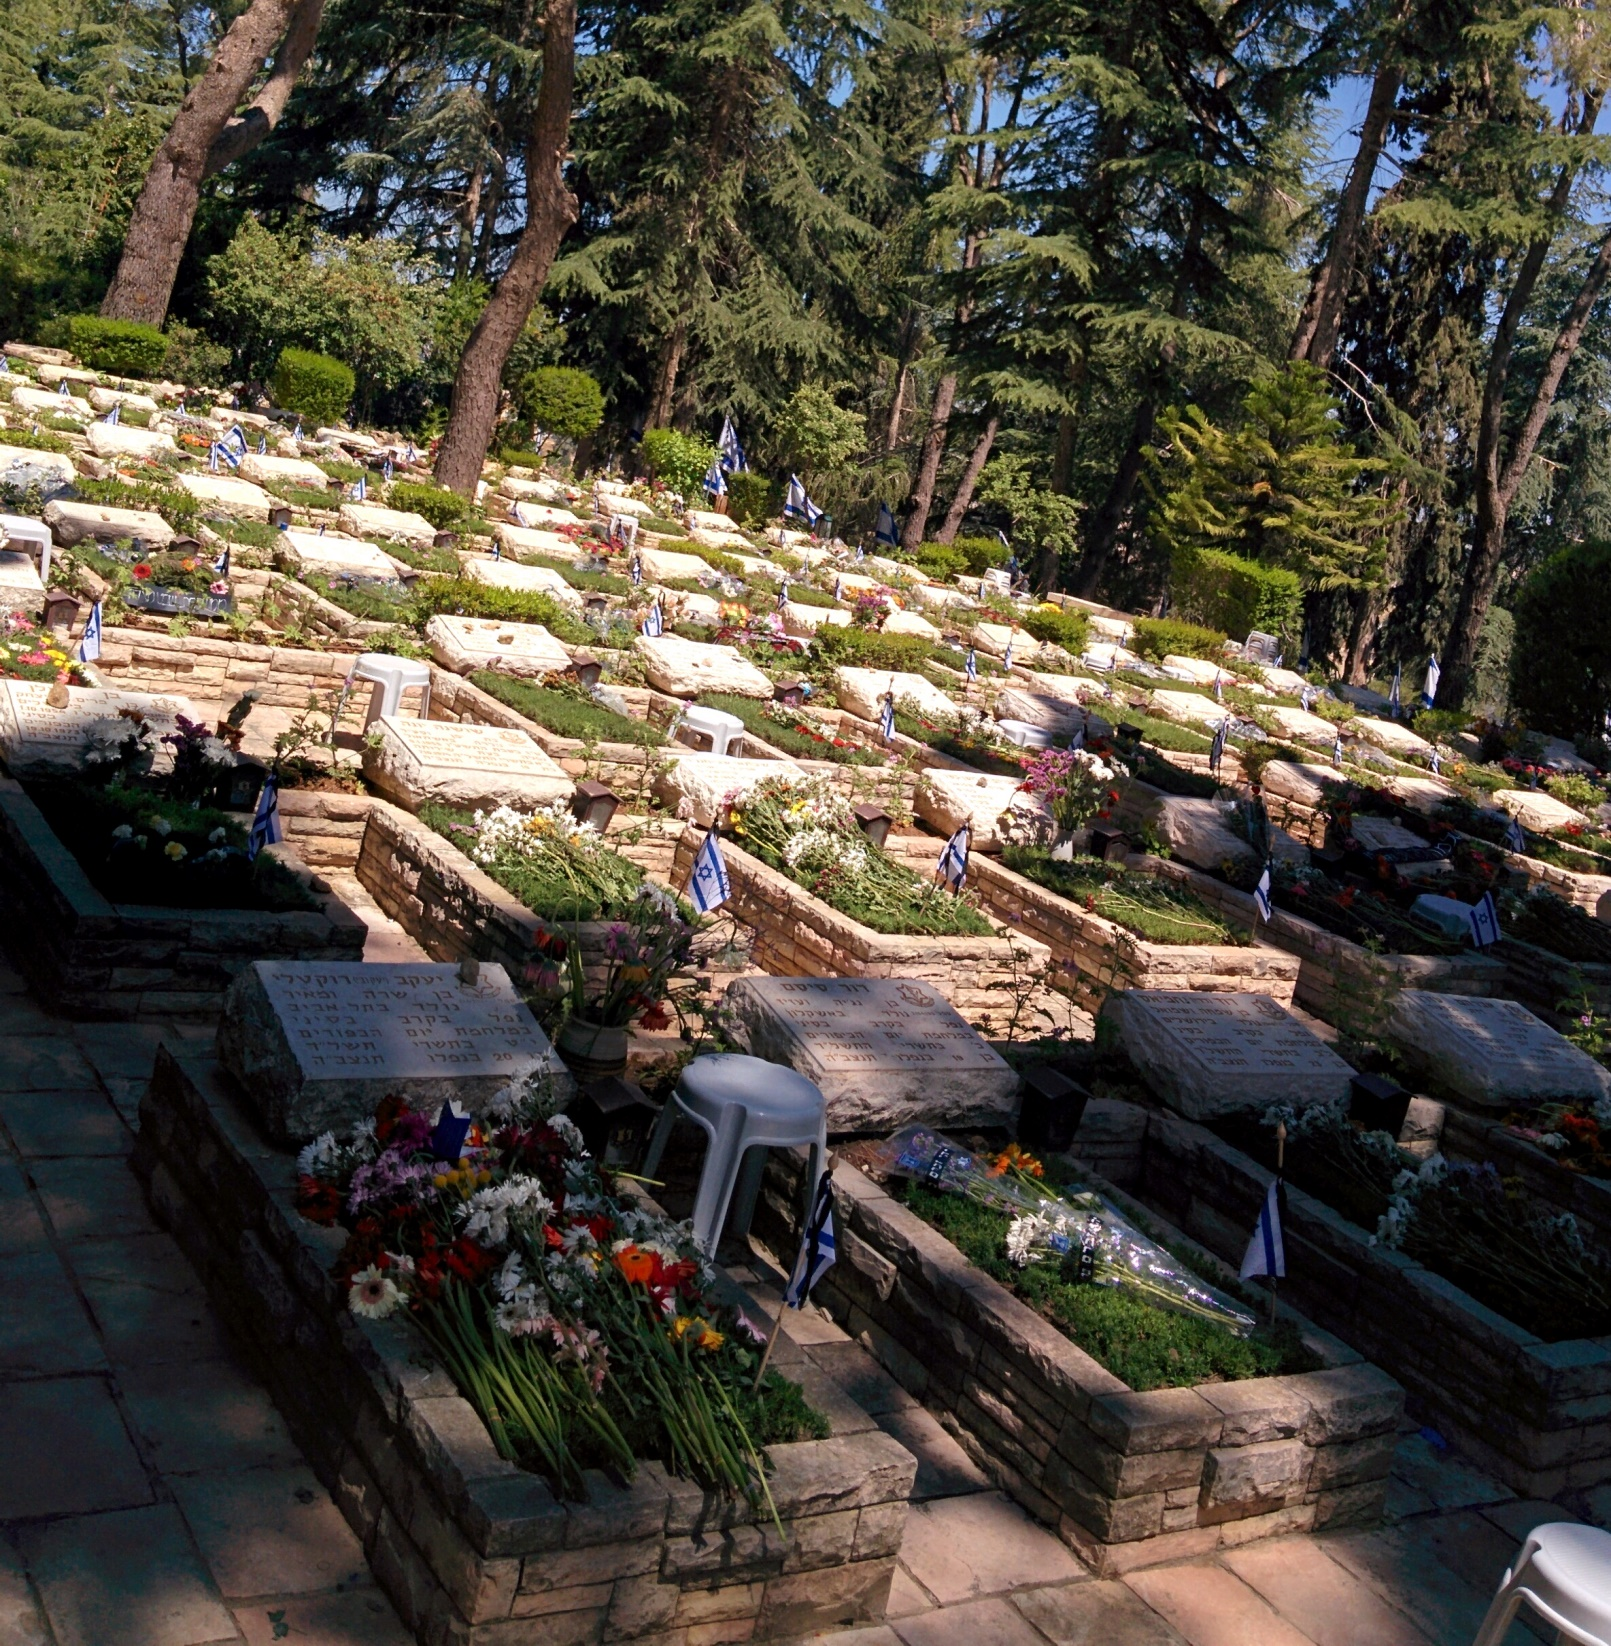 Graves in Mount Herzl's military cemetery. Photo by Abigail Klein Leichman